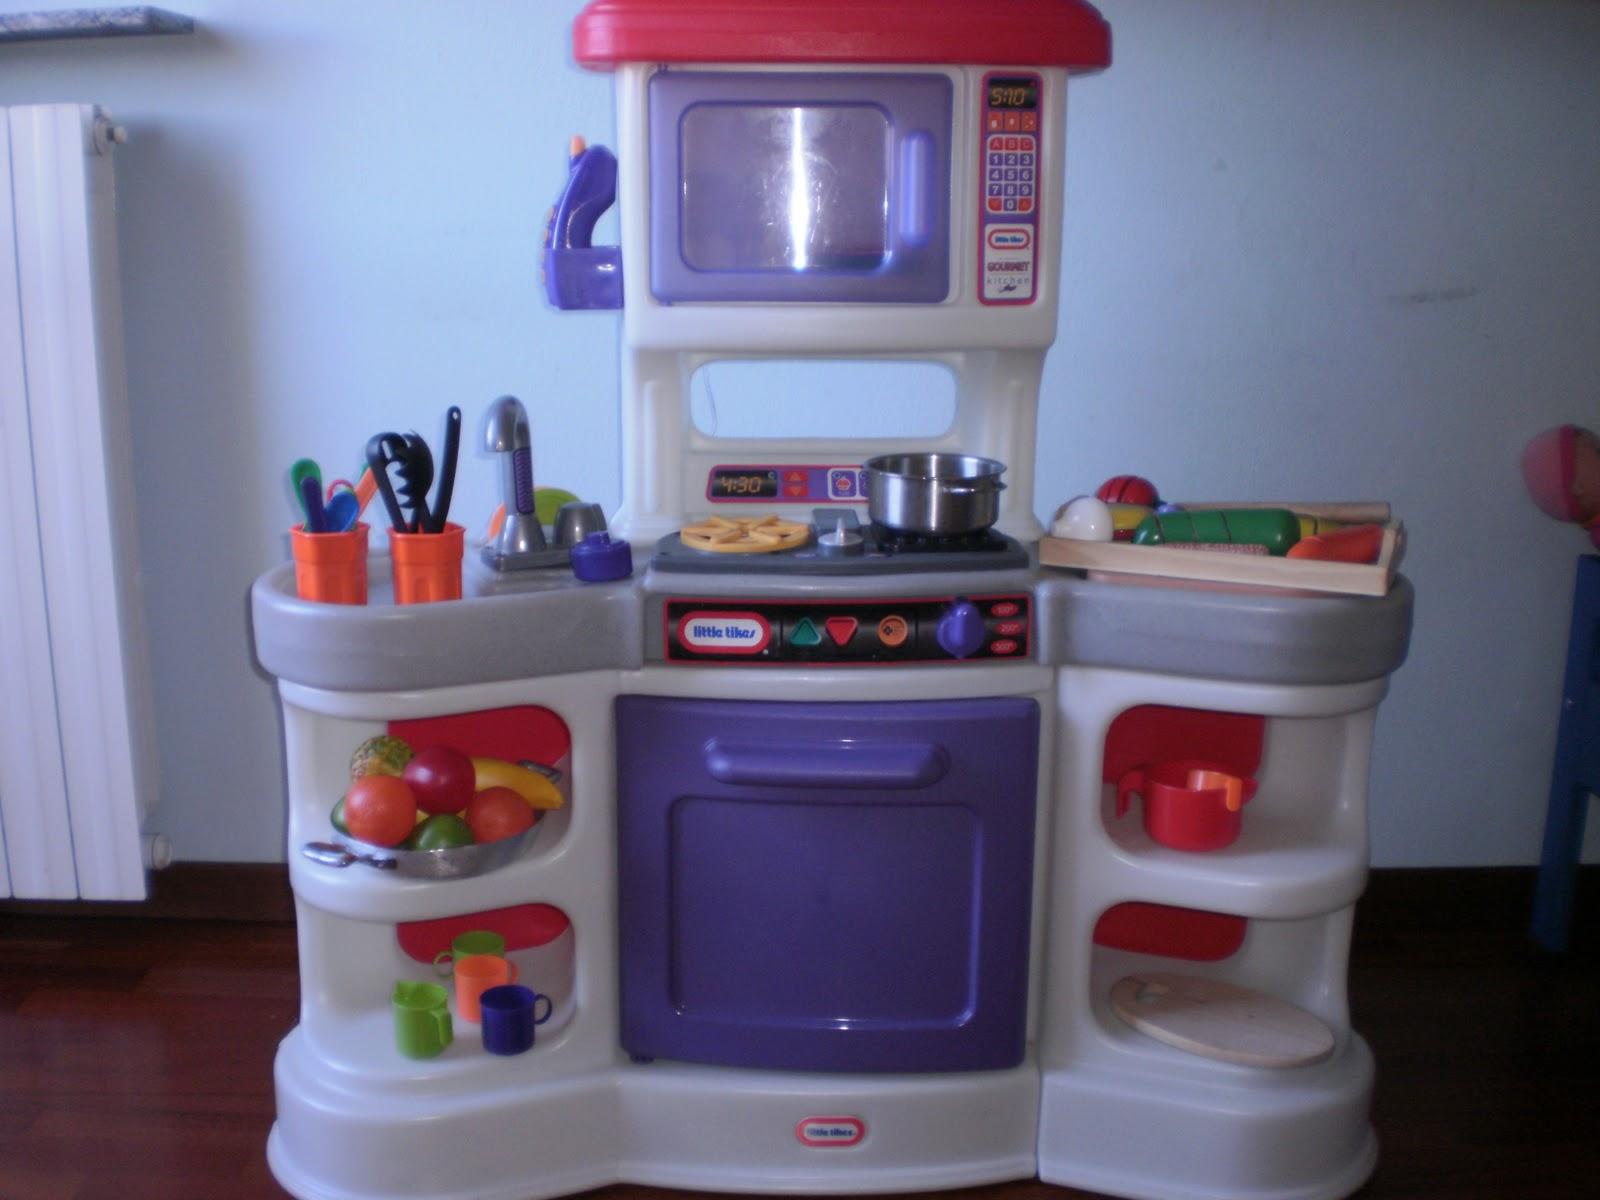 Cucine bambini ikea cucina bambini ikea usata cucina gioco ikea